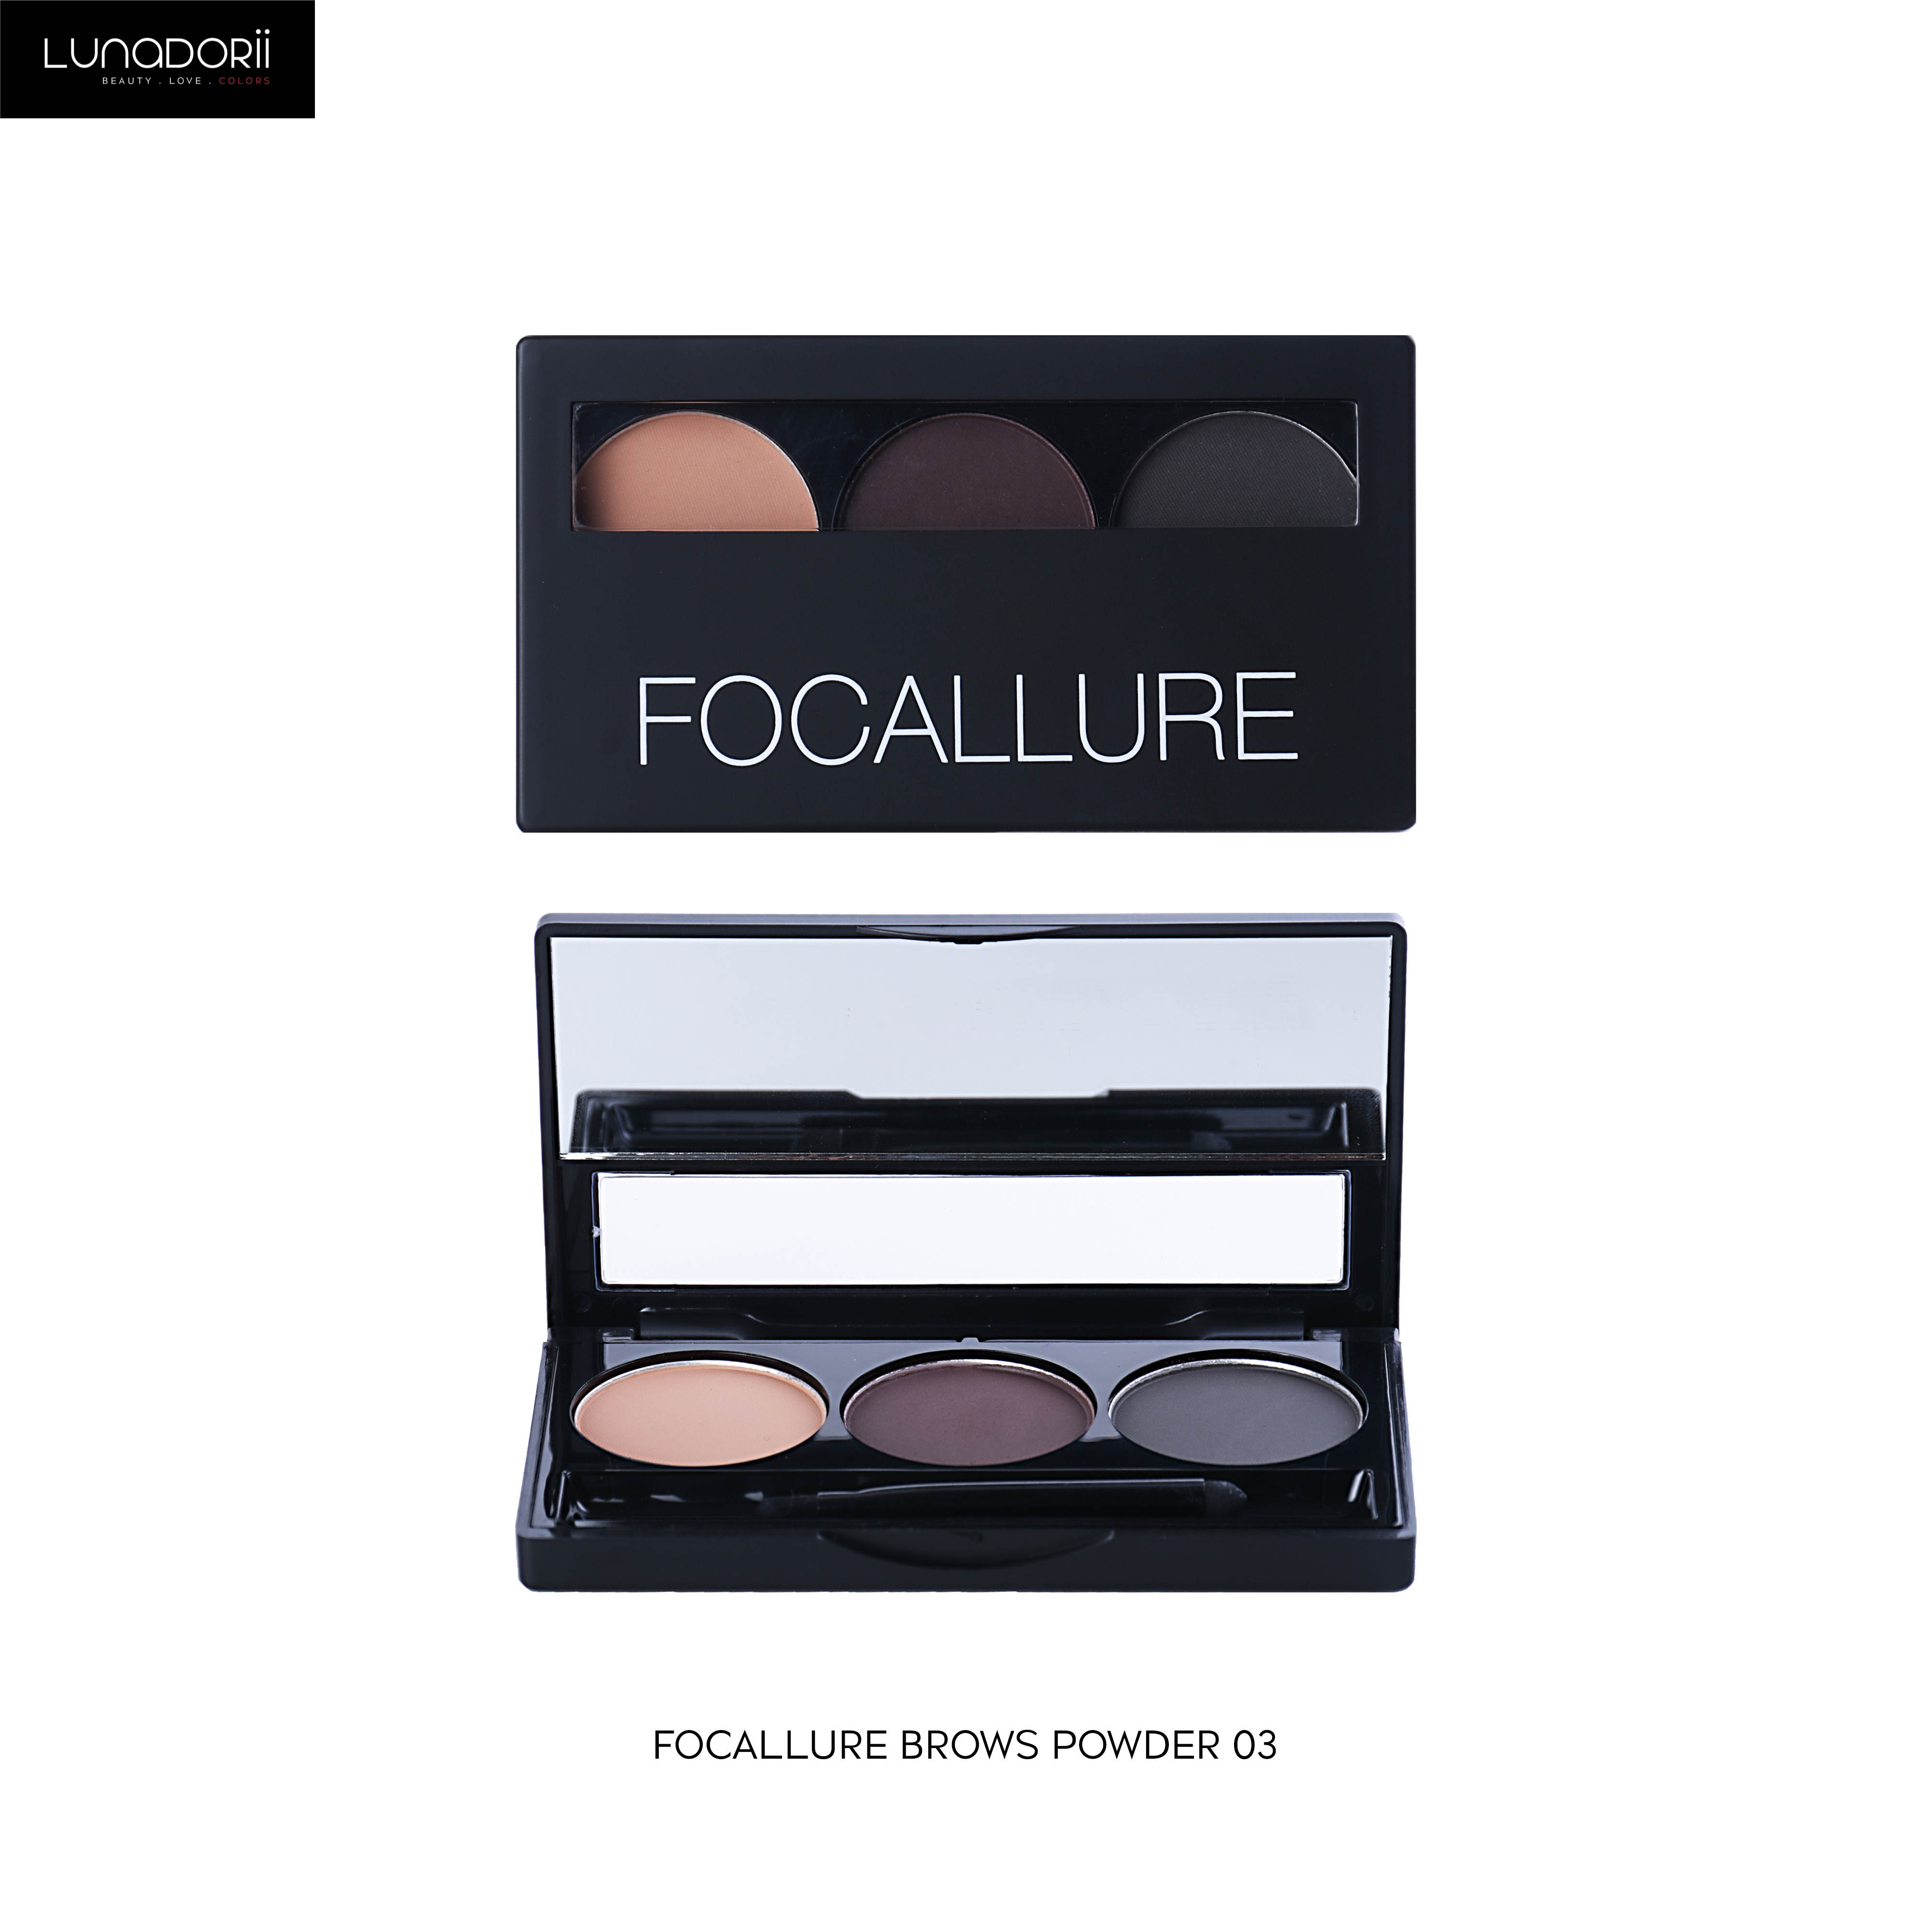 Focallure - FA04 Brows Powder - Brows Powder 03 thumbnail